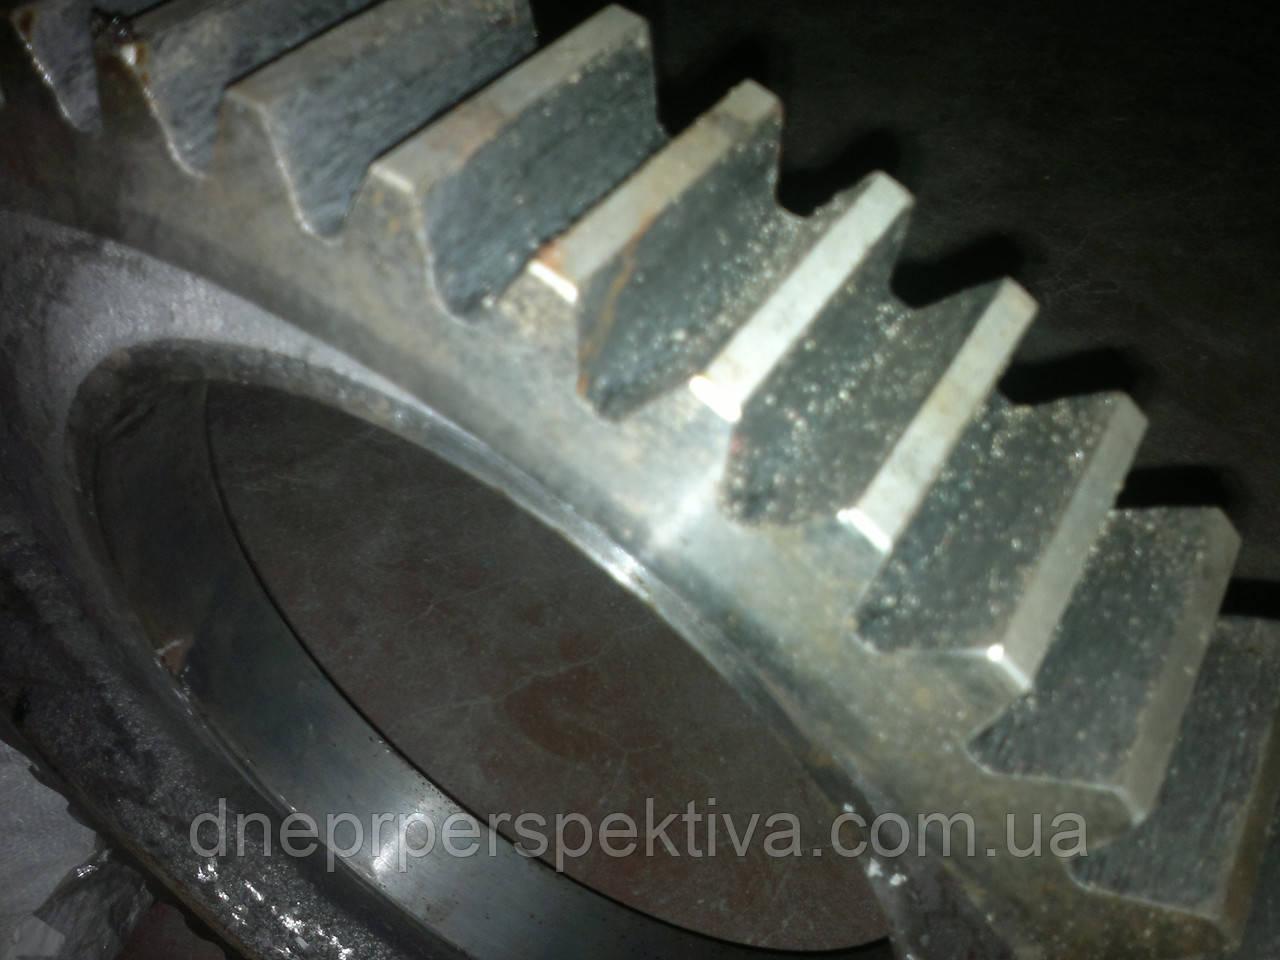 Зубчатые венцы хода кранового колеса